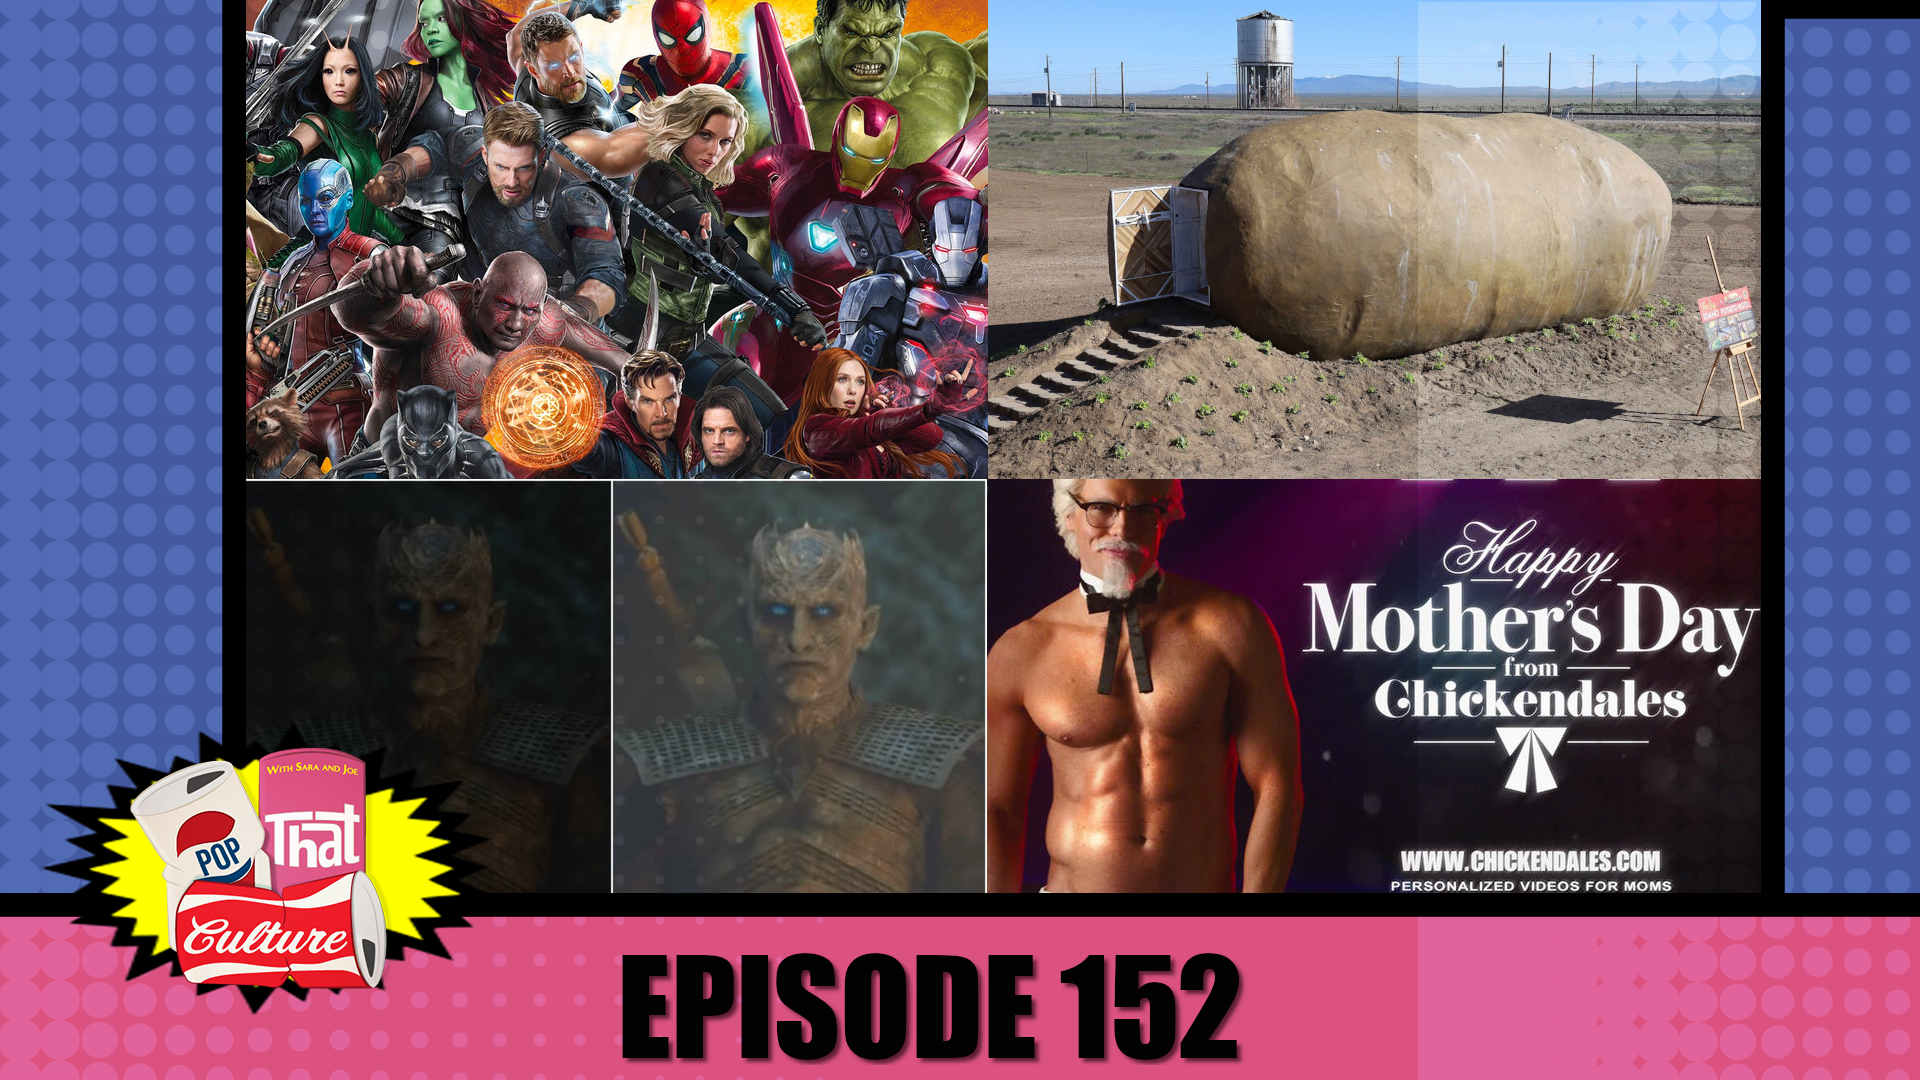 Pop That Culture - Episode 152